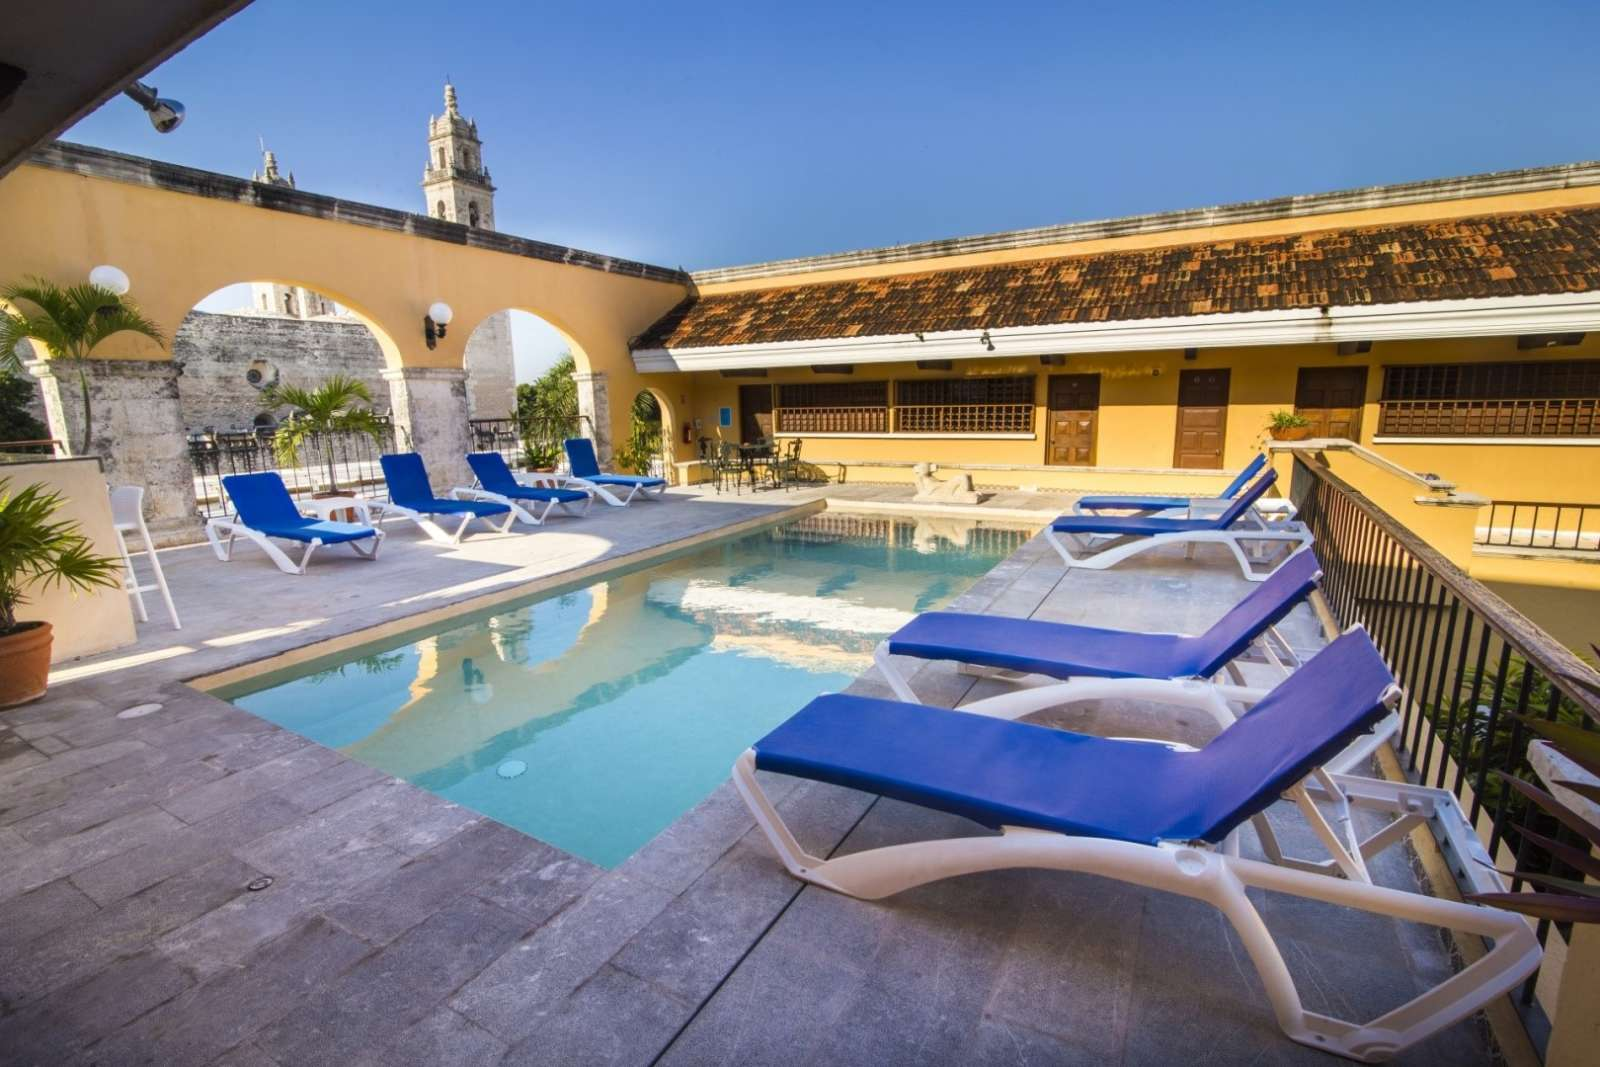 Pool at Hotel Caribe Merida